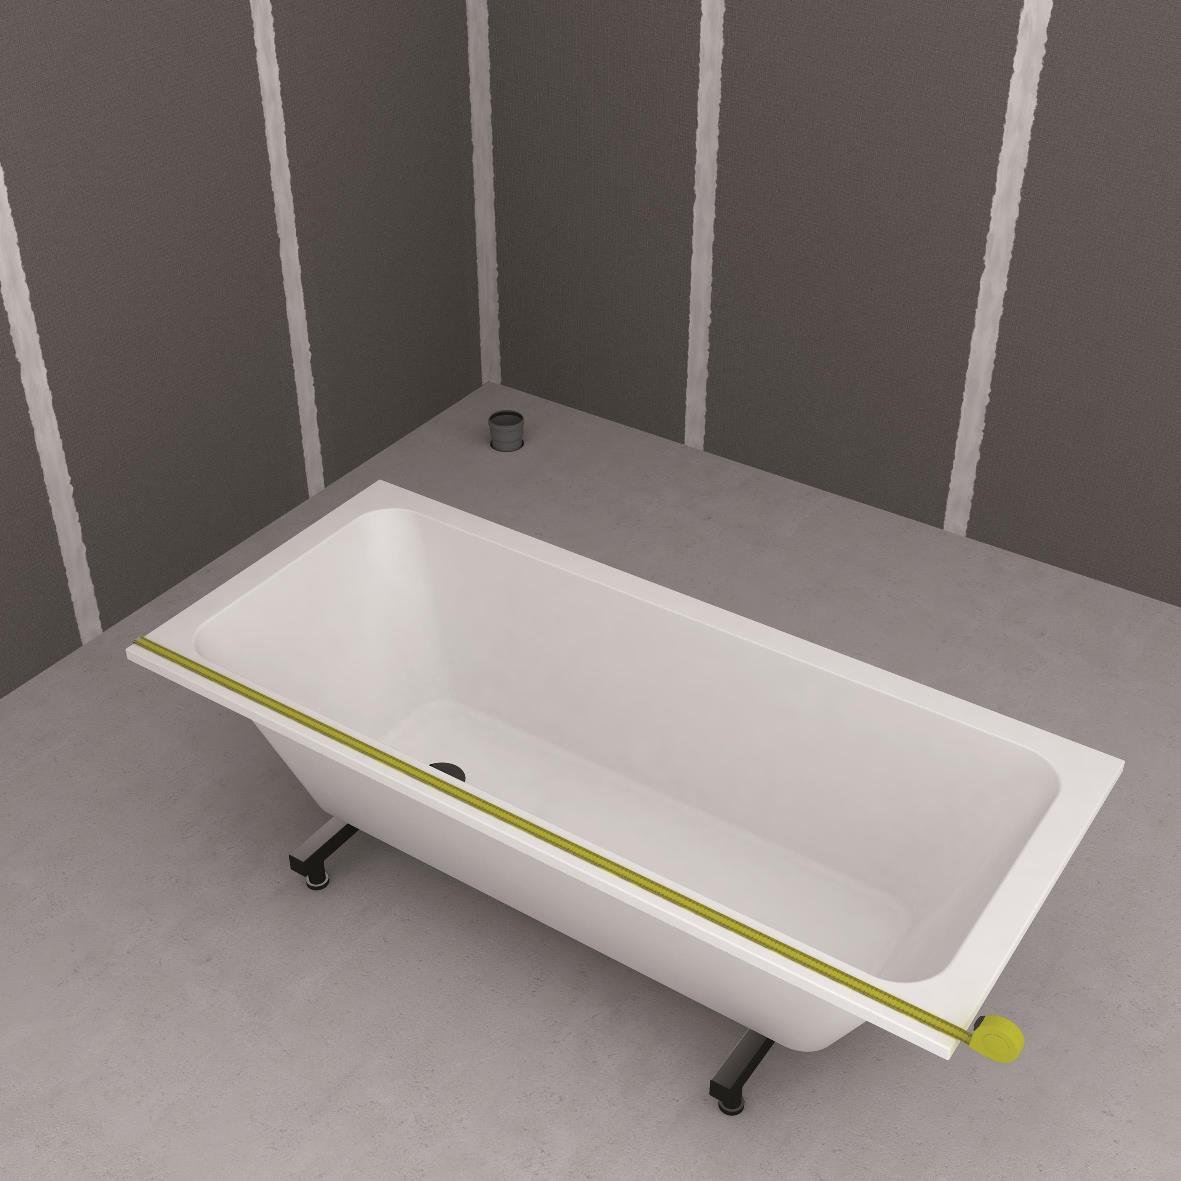 bande d 39 tanch it butyle wedi bandes auto adh sives de. Black Bedroom Furniture Sets. Home Design Ideas